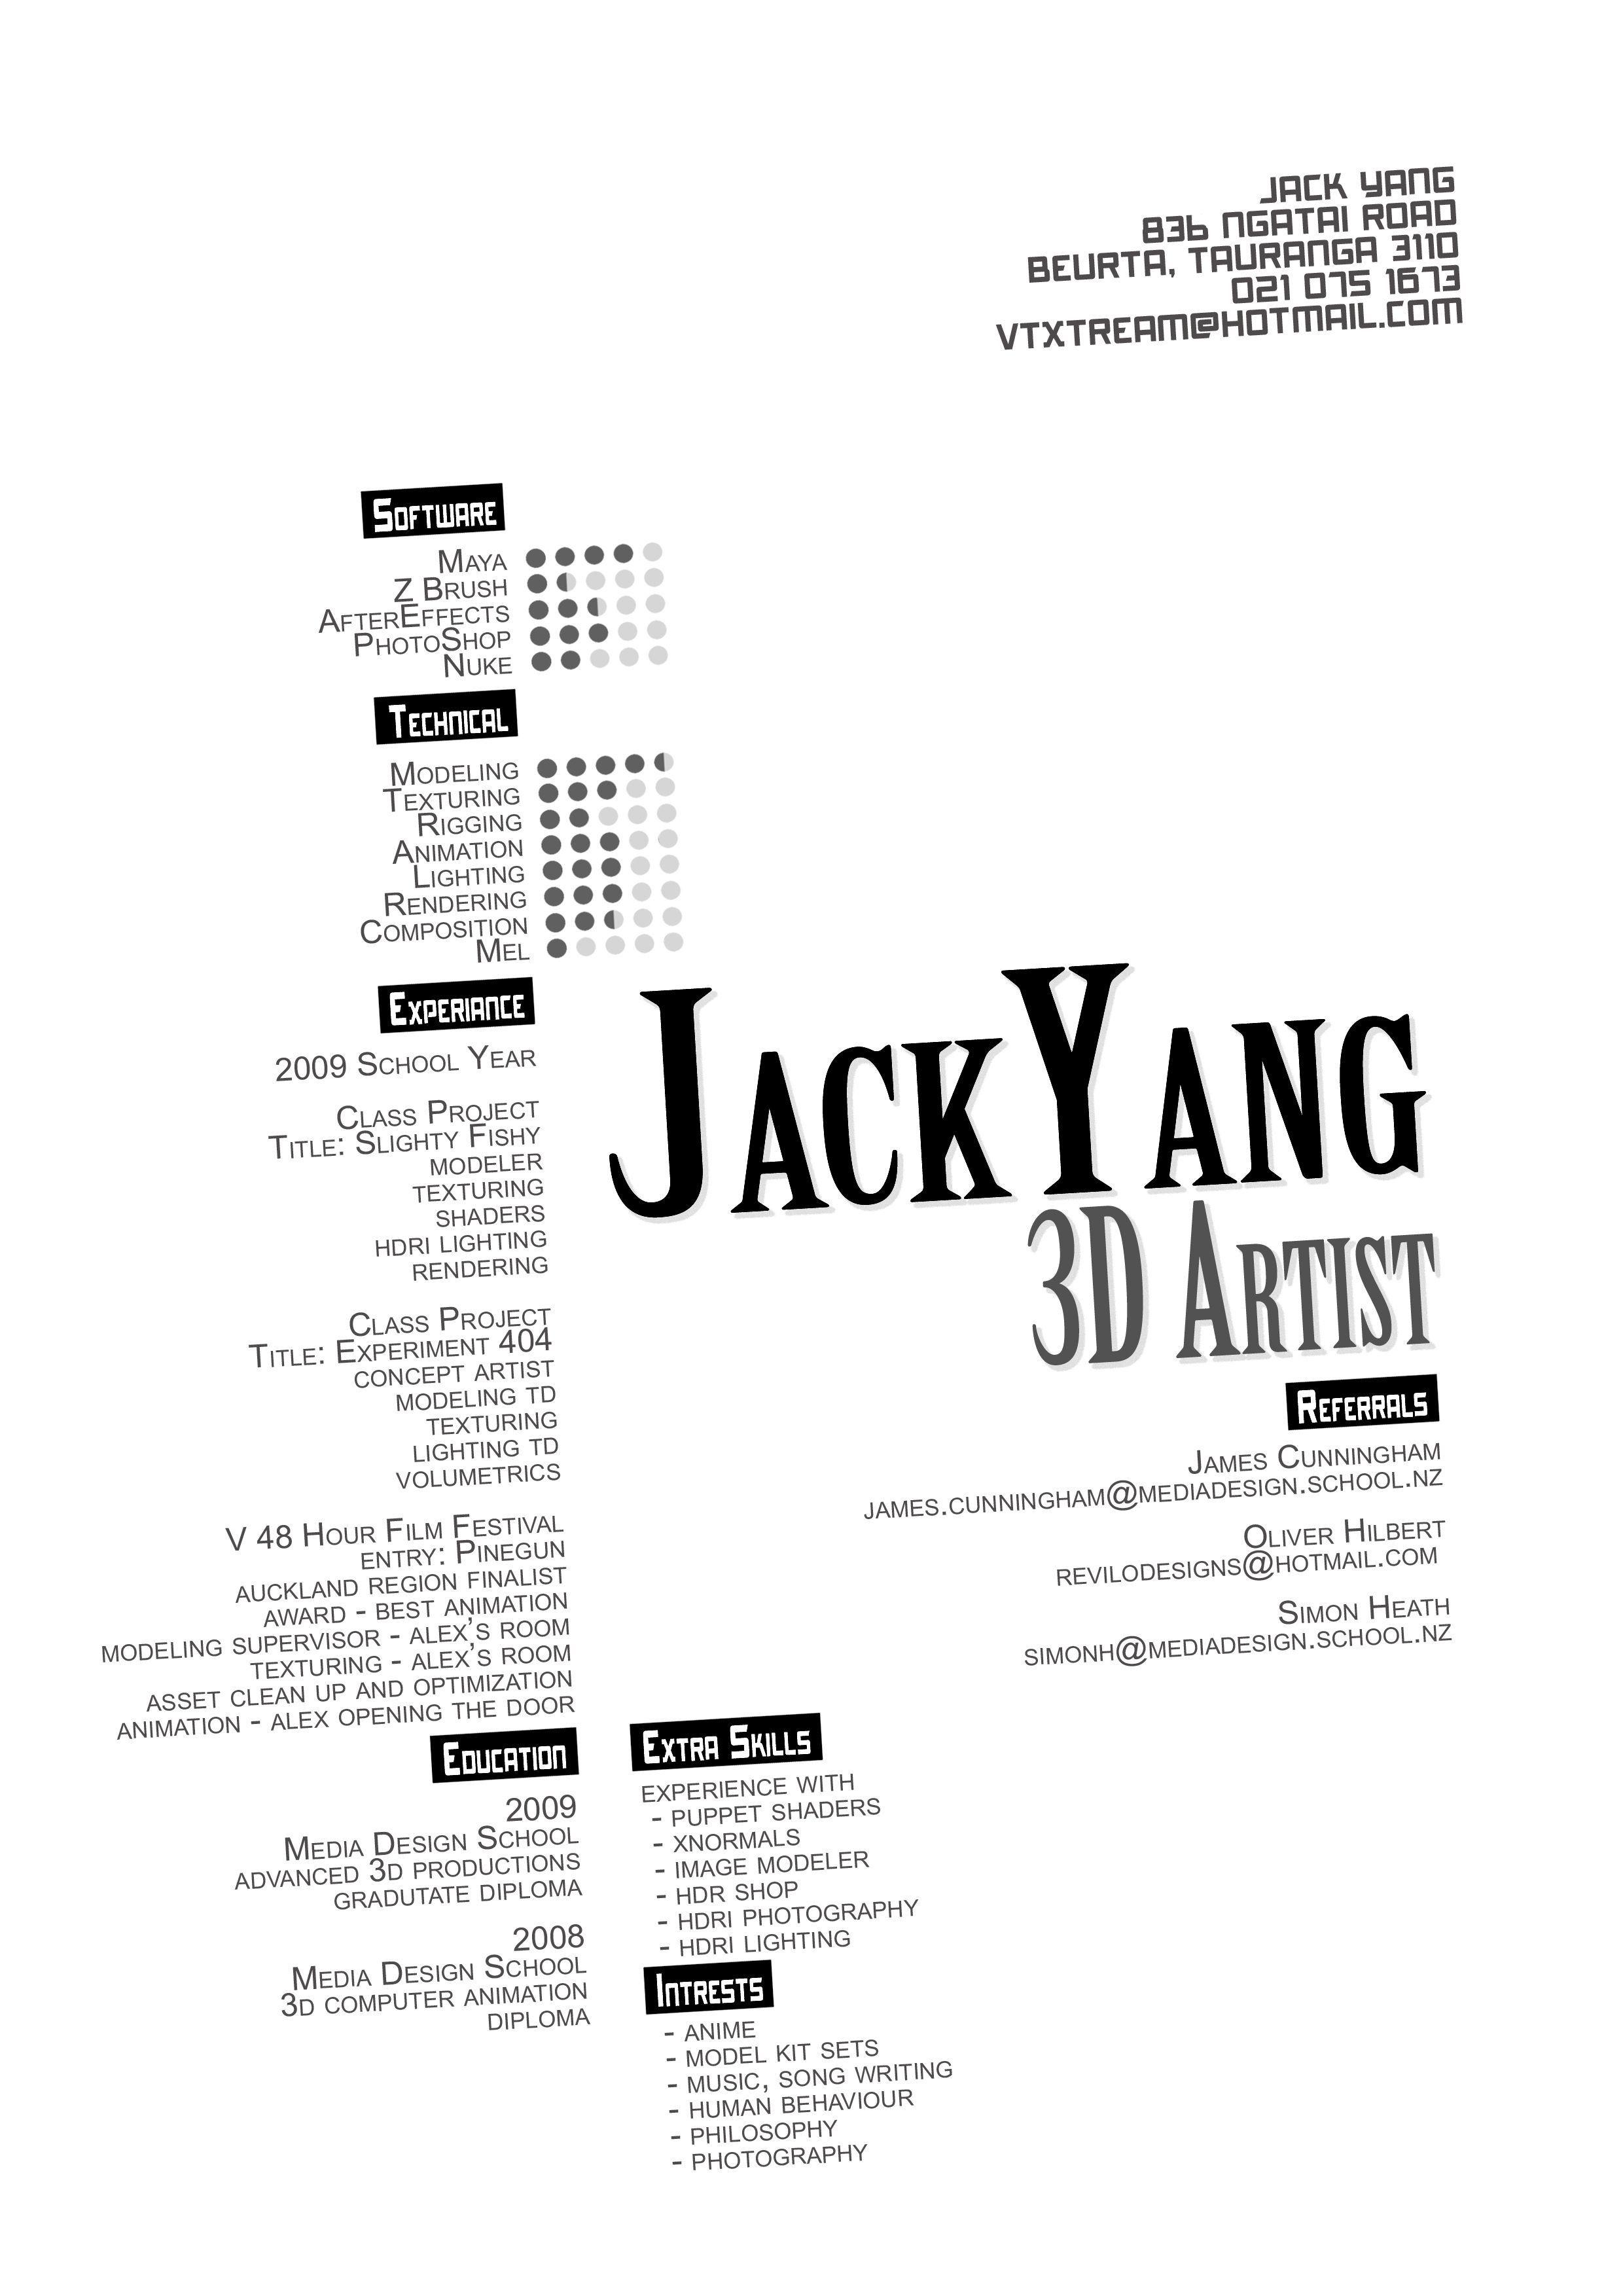 Resume Format 3d Artist In 2020 With Images Resume Design